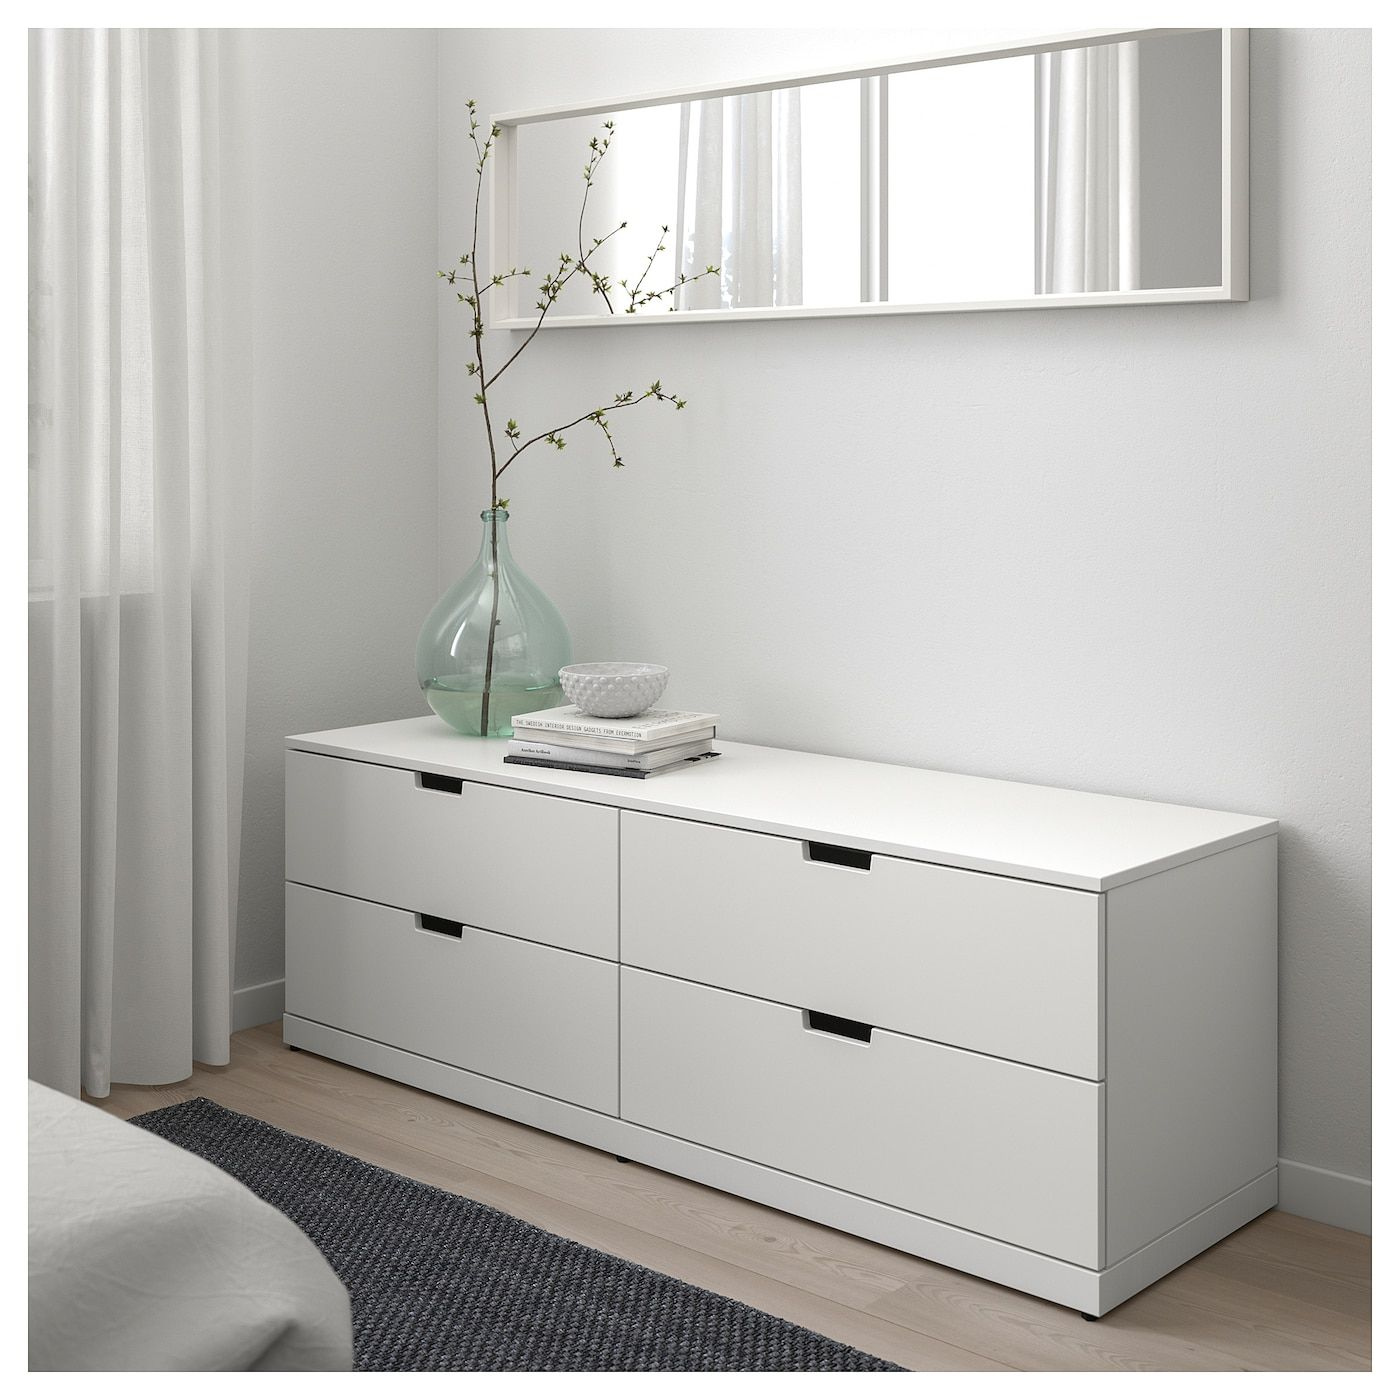 Nordli Kommode 4 Skuffer Hvid 160x54 Cm Ikea Ideer